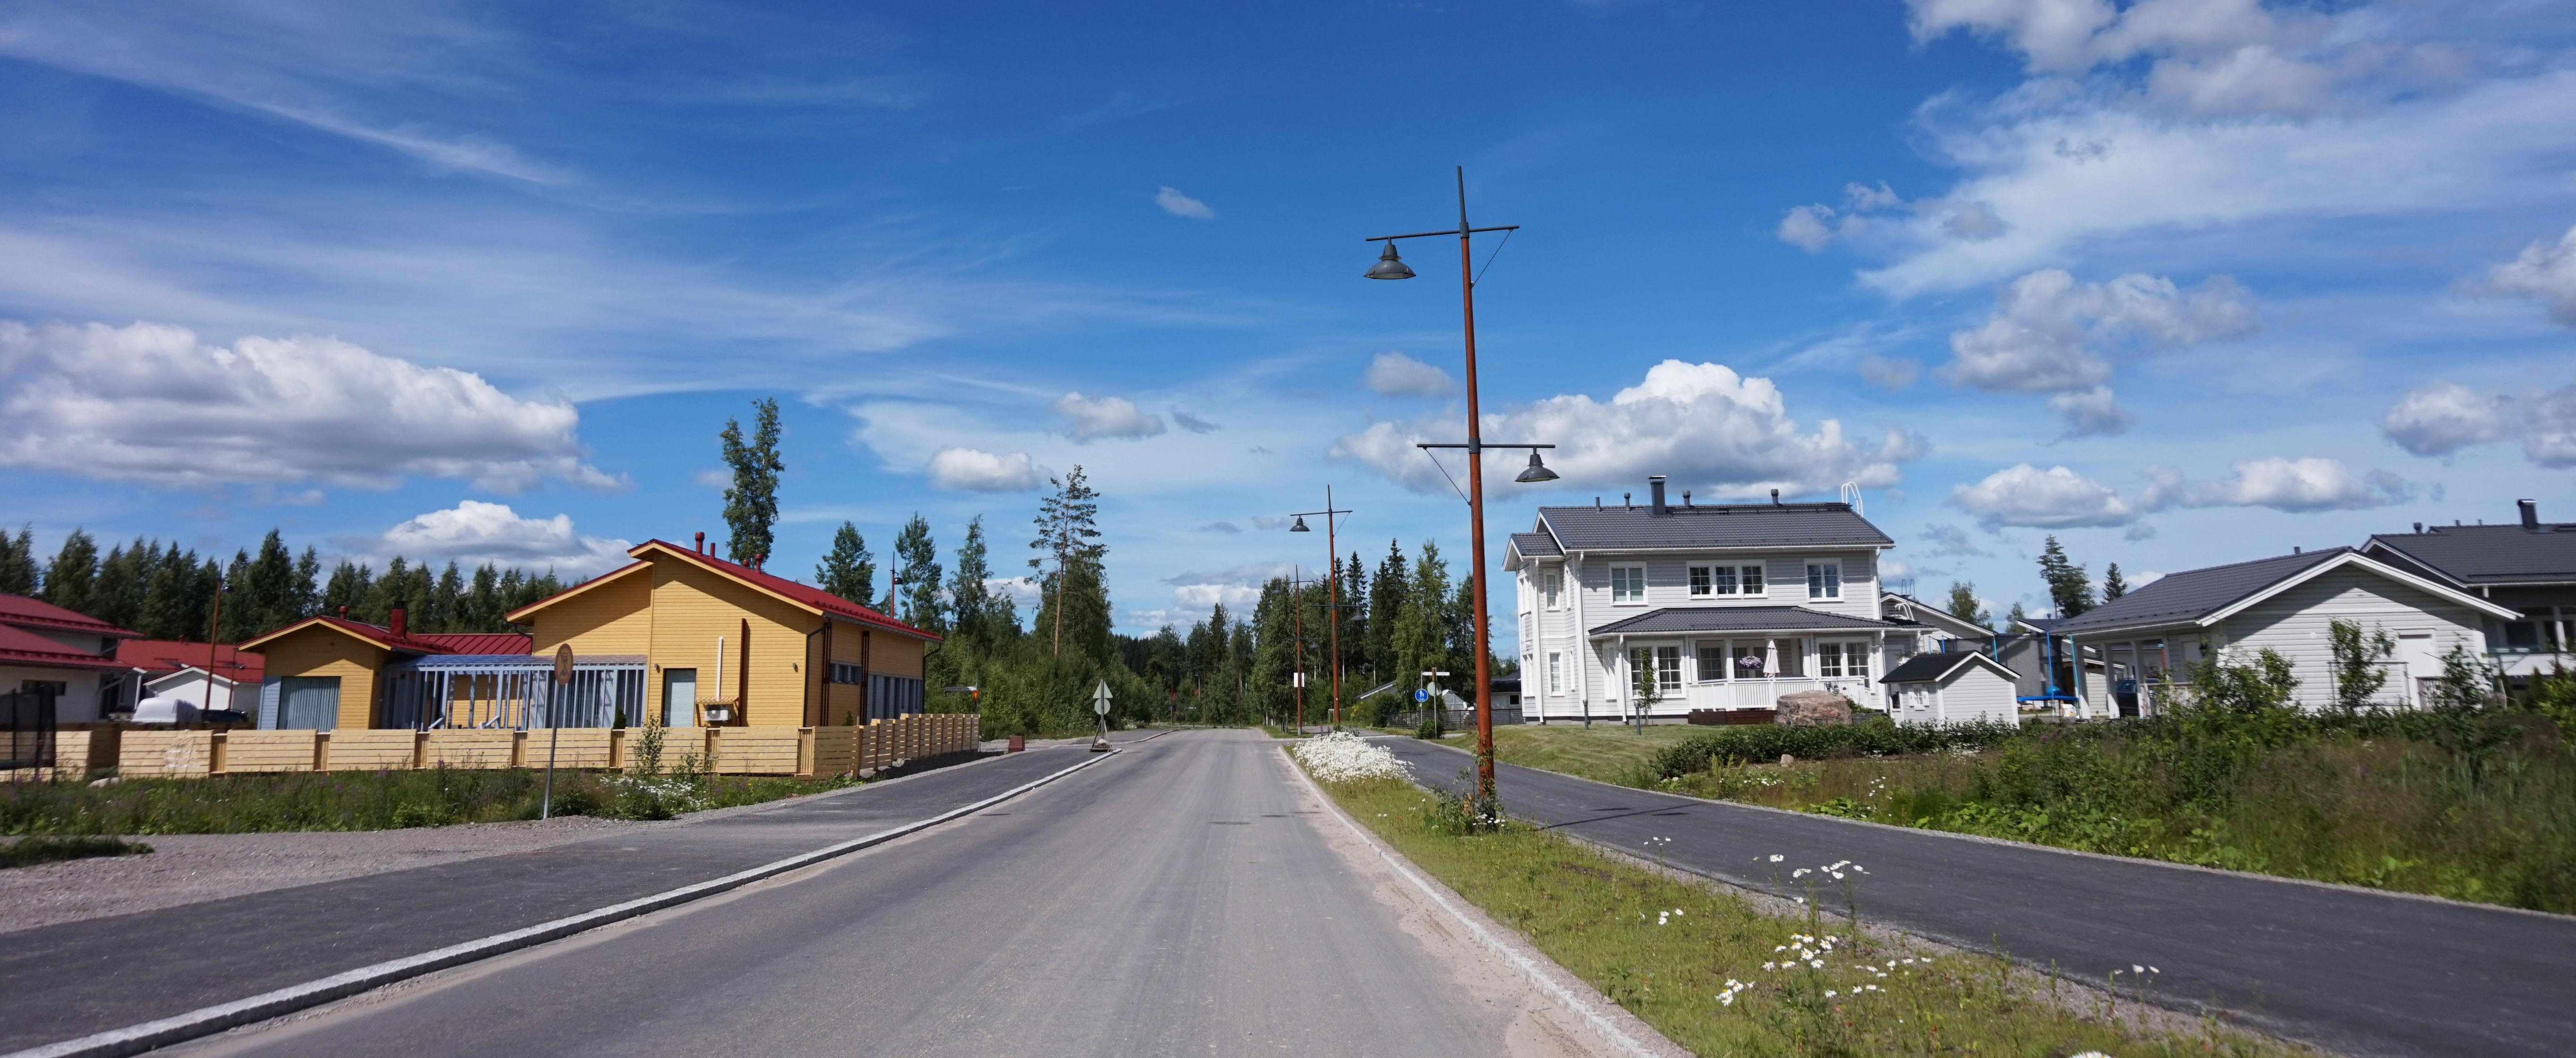 Karisto Lahti Wikipedia